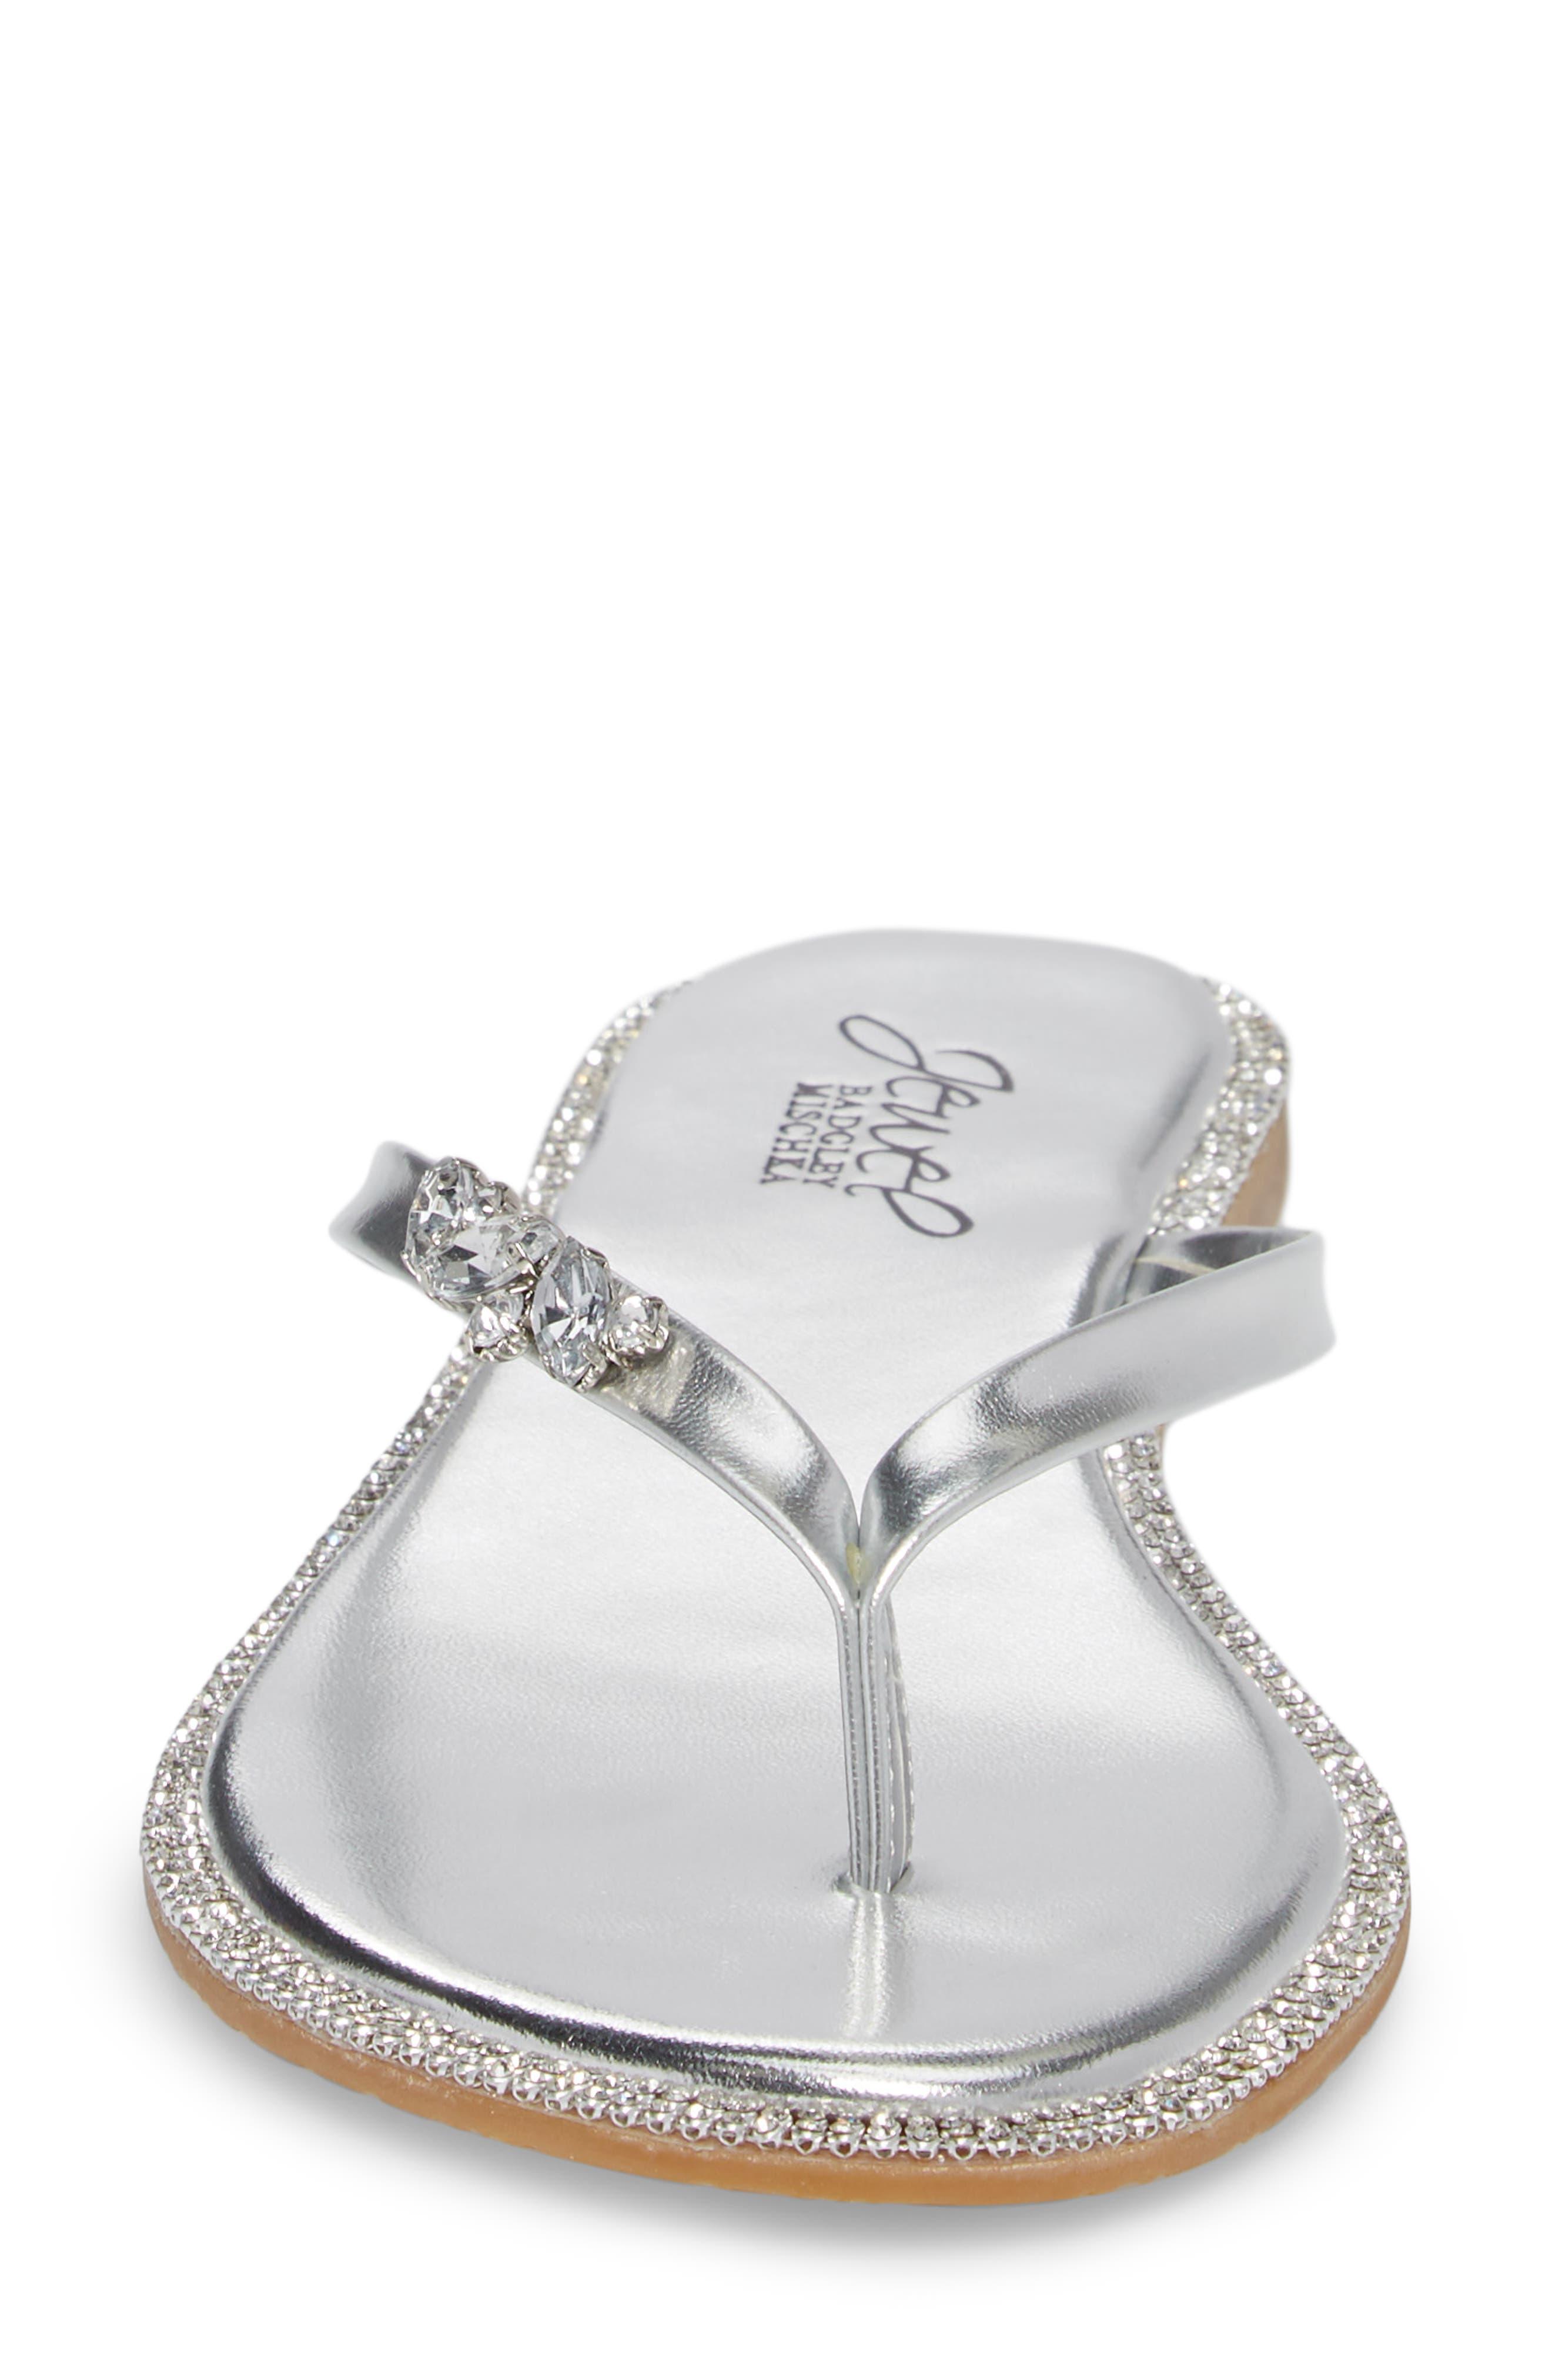 Thalia Crystal Embellished Flip Flop,                             Alternate thumbnail 4, color,                             Silver Leather